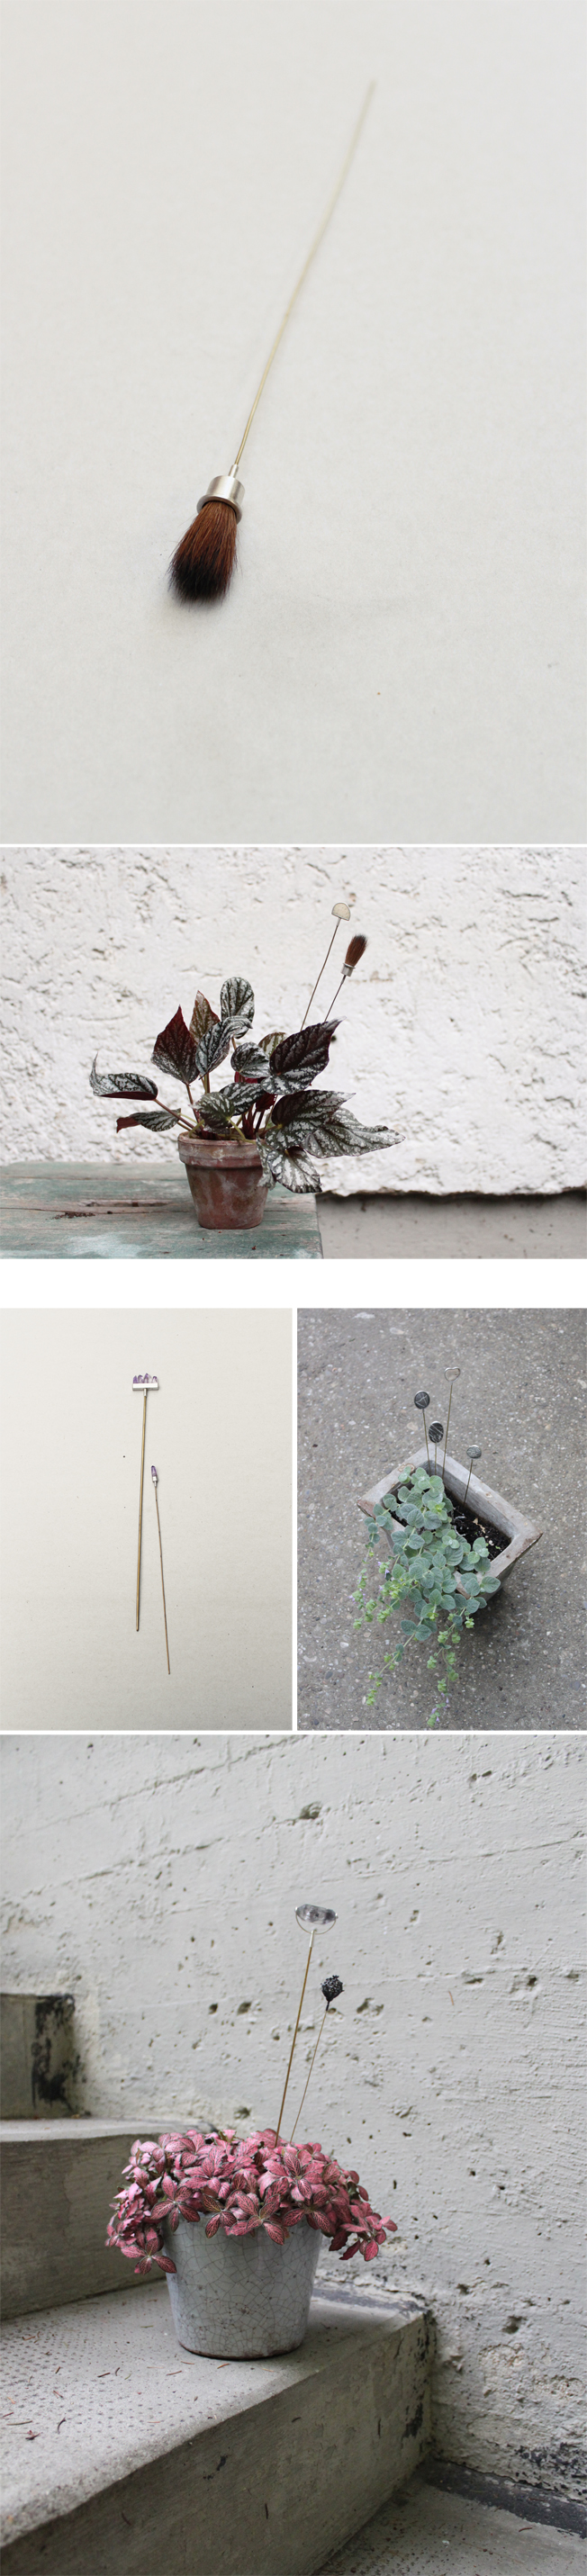 PLANT JEWELS - wsake